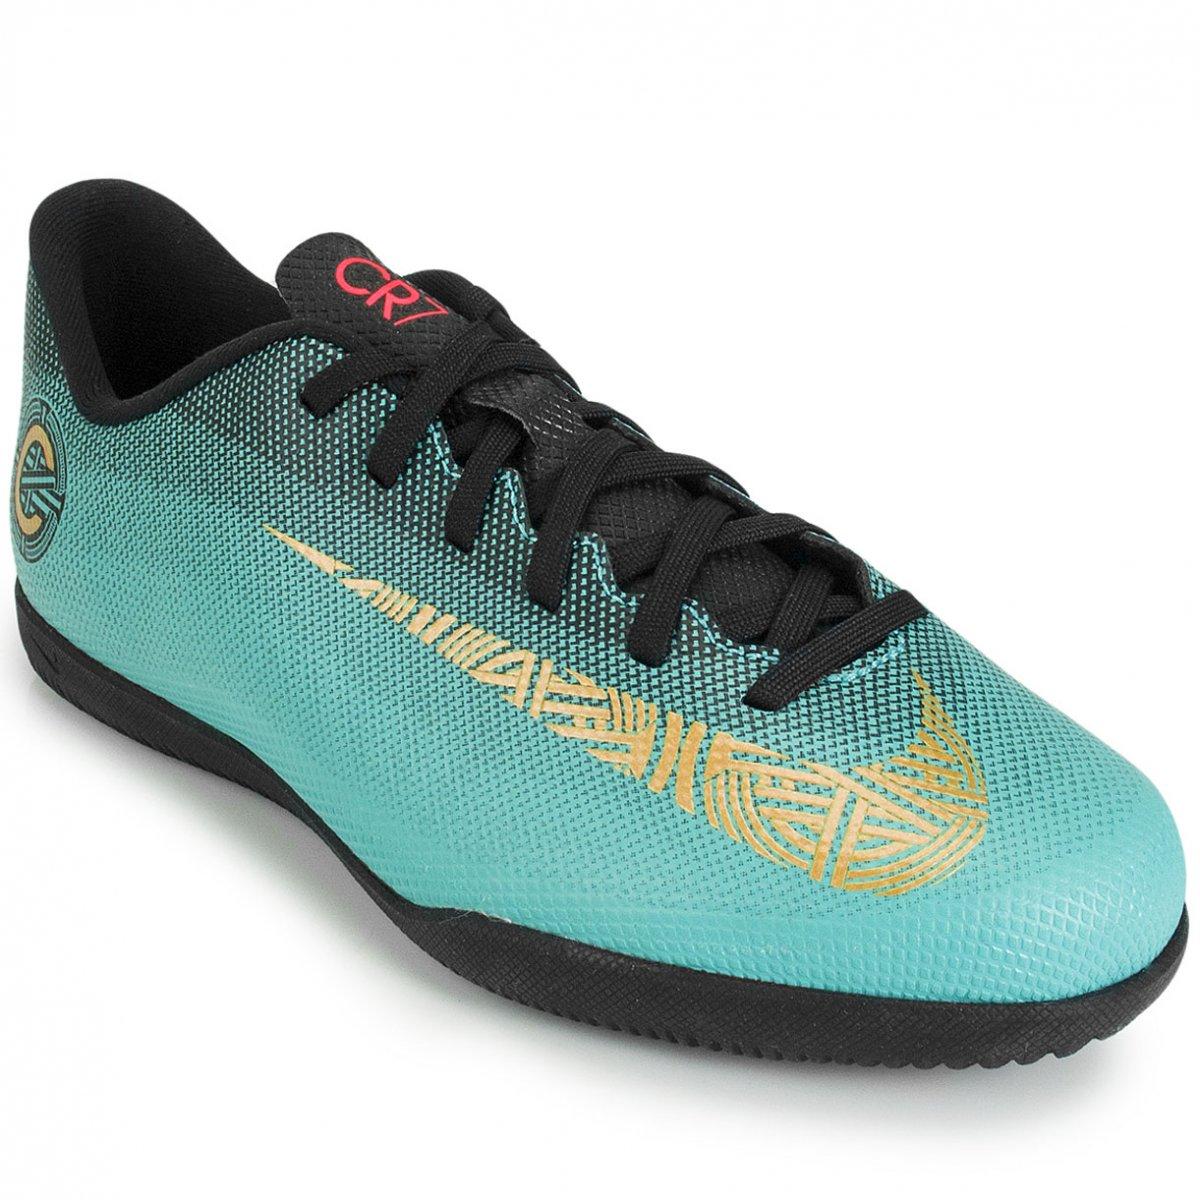 94647a0ce2 Chuteira Nike Mercurial VaporX 12 Club GS CR7 IC